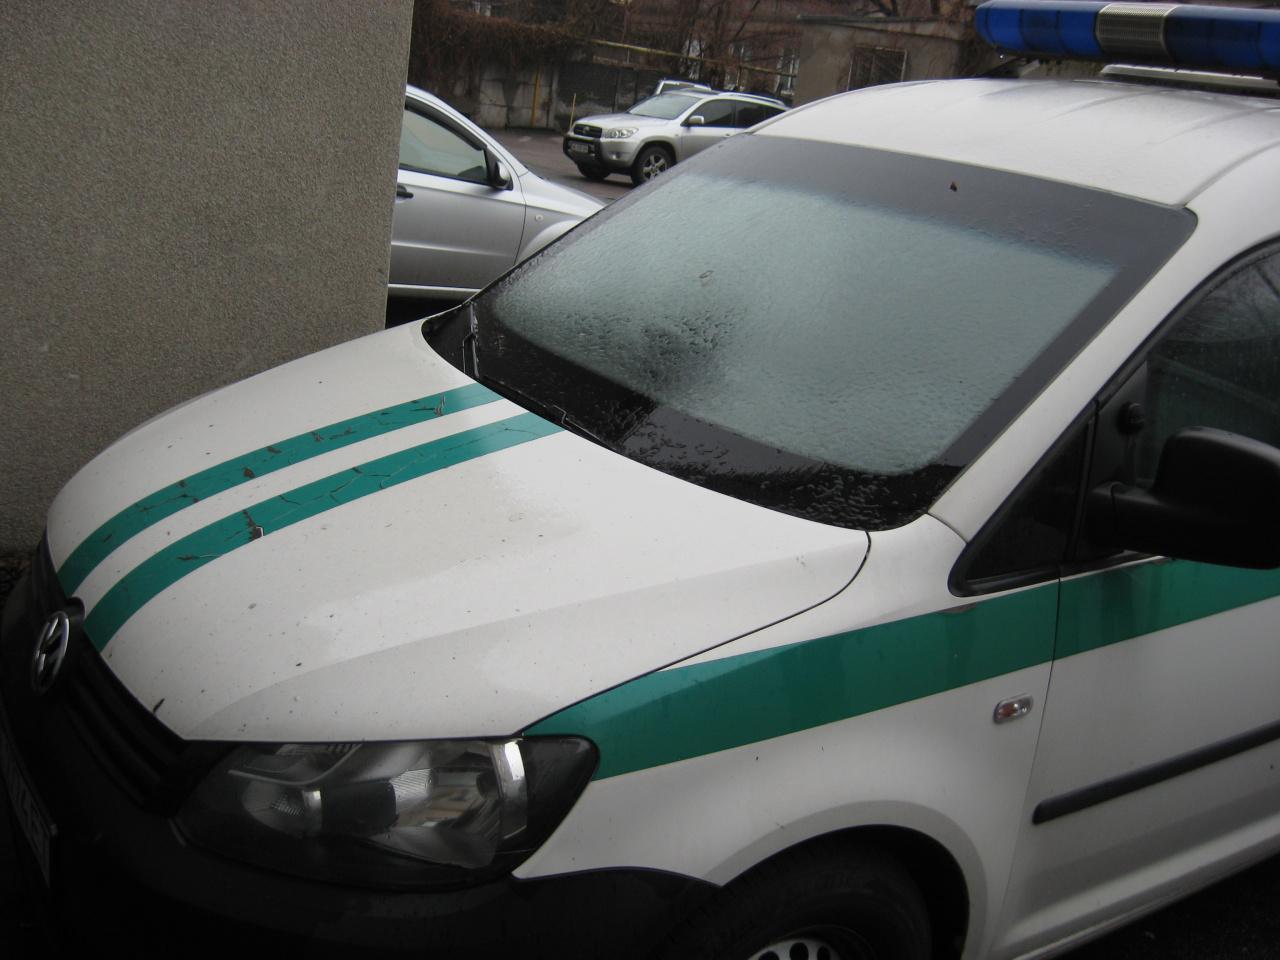 Вантажно -пасажирський VOLKSWAGEN CADDY, рік випуску – 2011, номер шасі, кузова WV1ZZZ2KZCX067957, номер державної реєстрації АЕ2774ЕТ